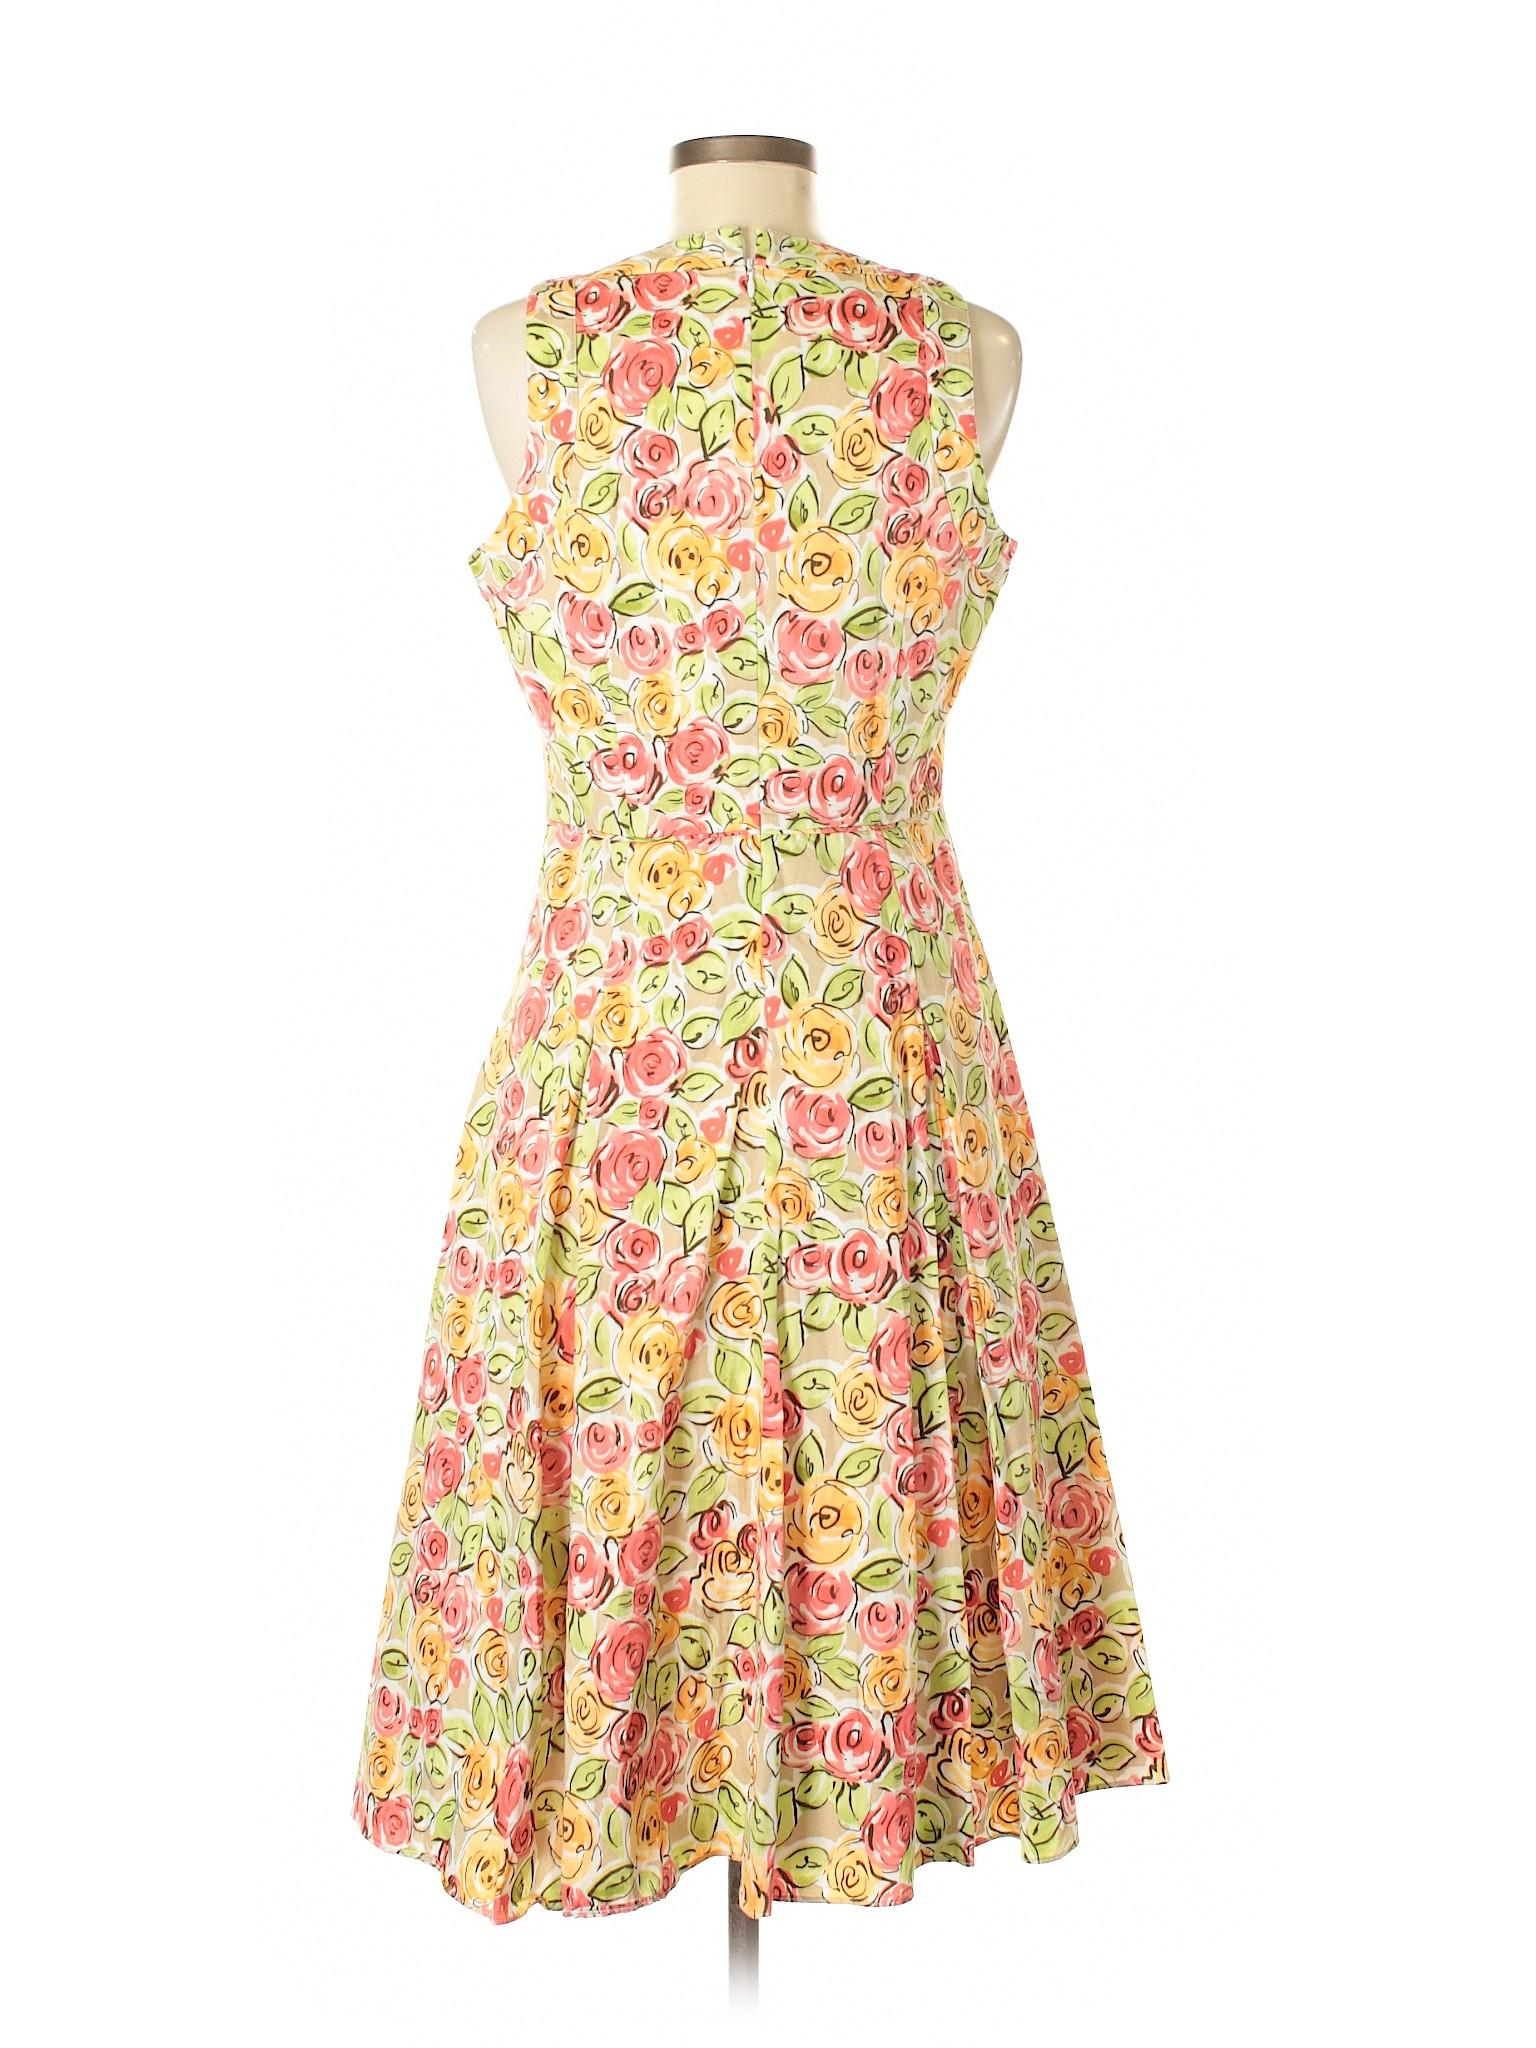 Dress Dress Boutique winter Casual winter Casual Dress Casual Boutique Talbots Boutique Talbots Talbots winter tgg0Oxq